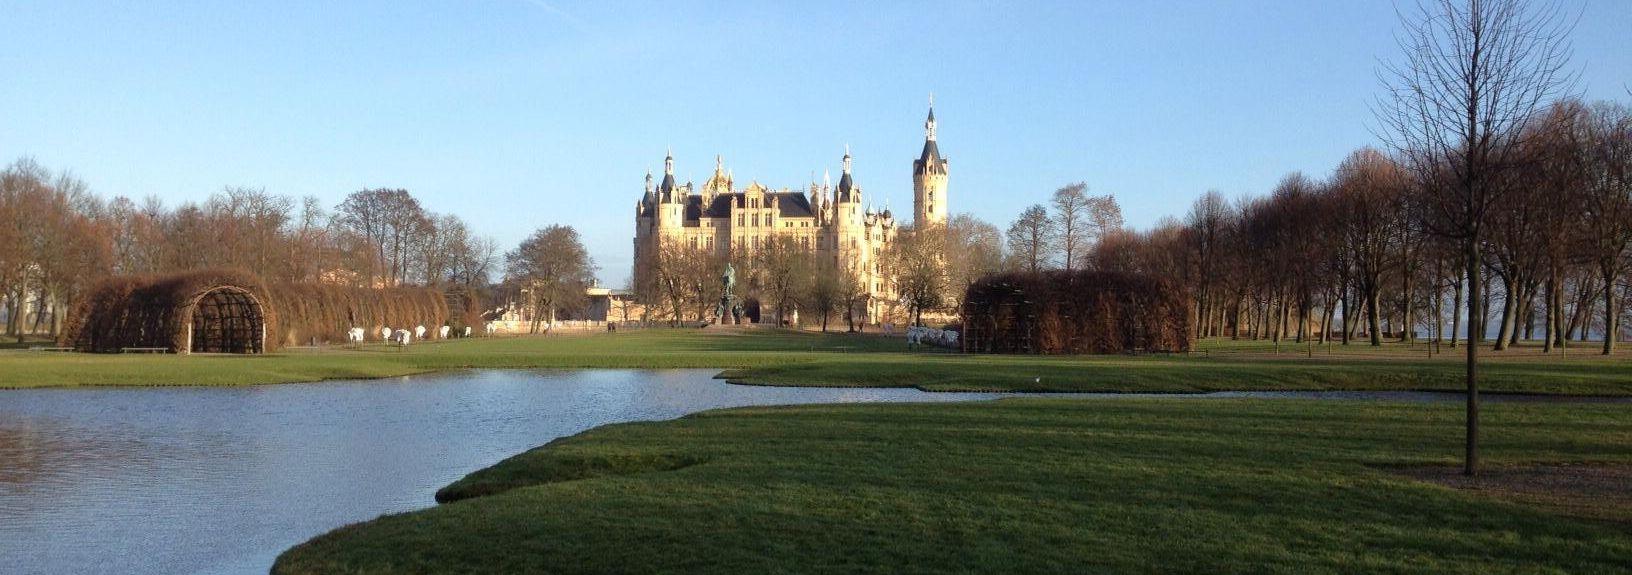 Castelo de Neustadt-Glewe, Neustadt-Glewe, Mecklemburgo - Pomerânia Ocidental, Alemanha